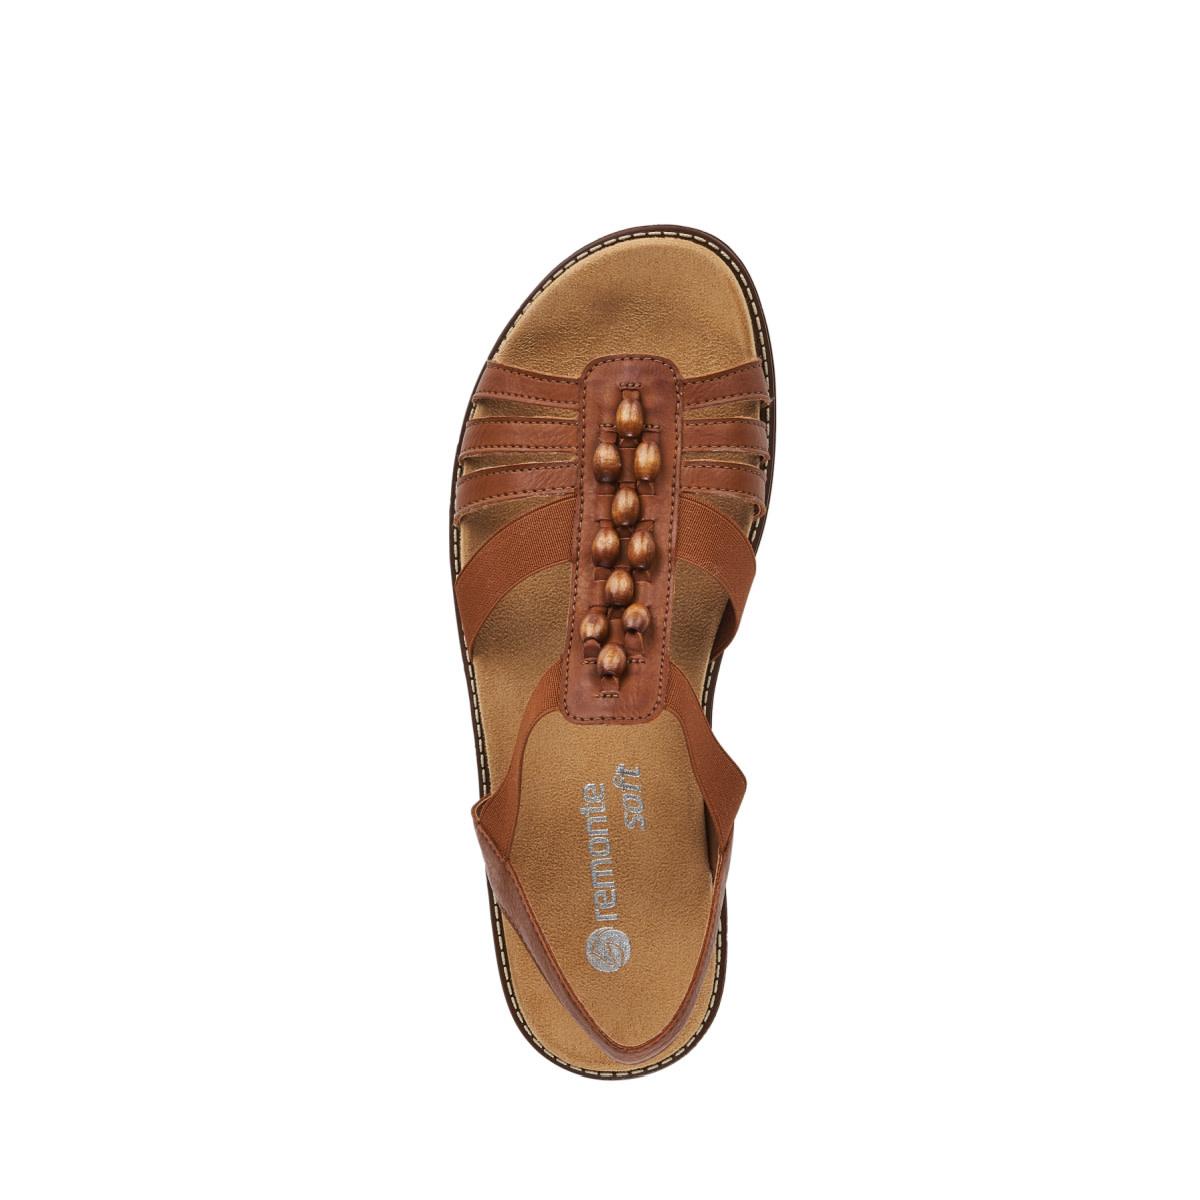 Remonte Remonte D2065-24 Sandal Brown